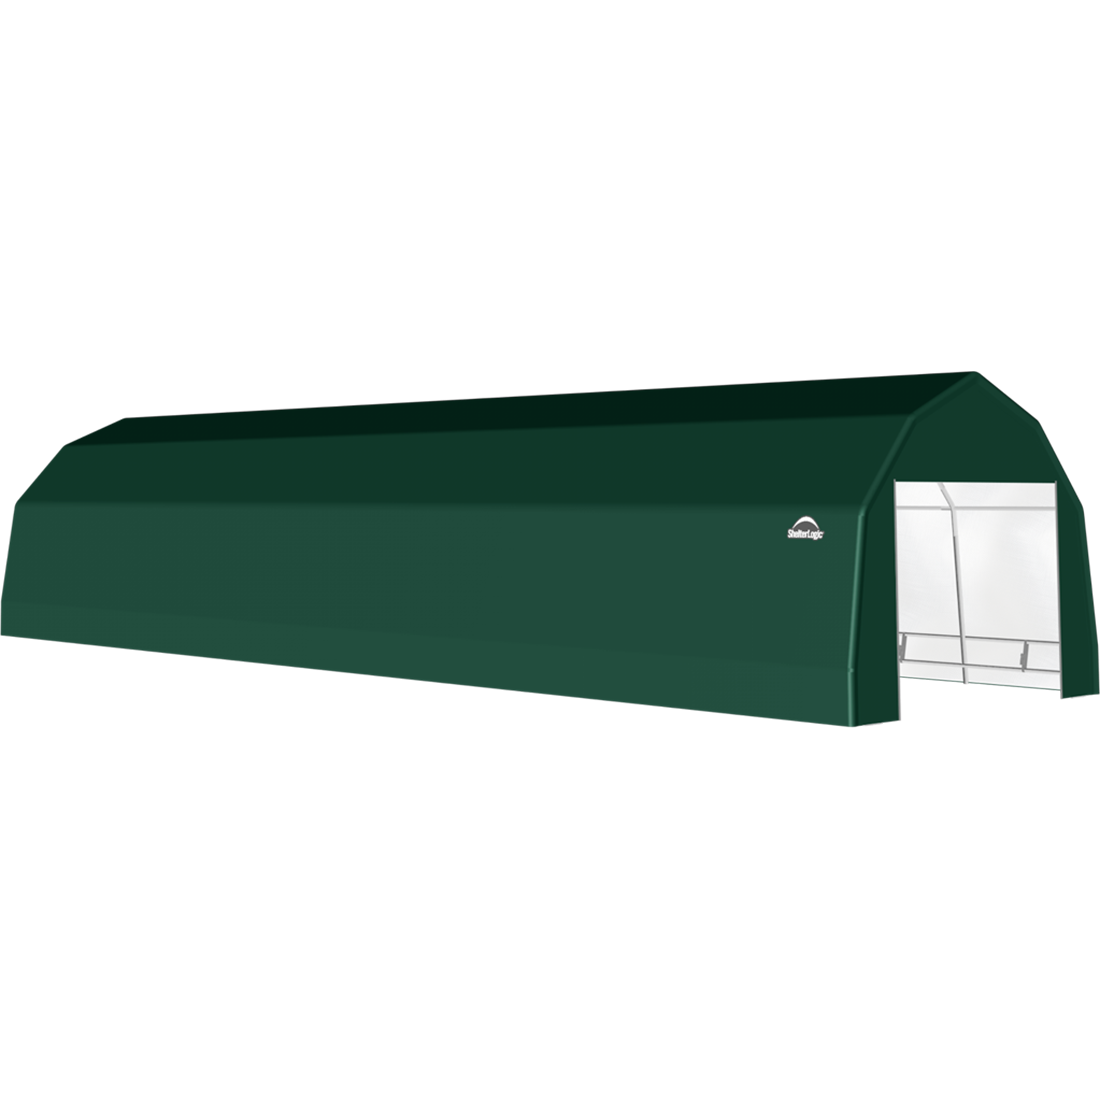 SP Barn 12X48X9 Green 14 oz PE Shelter